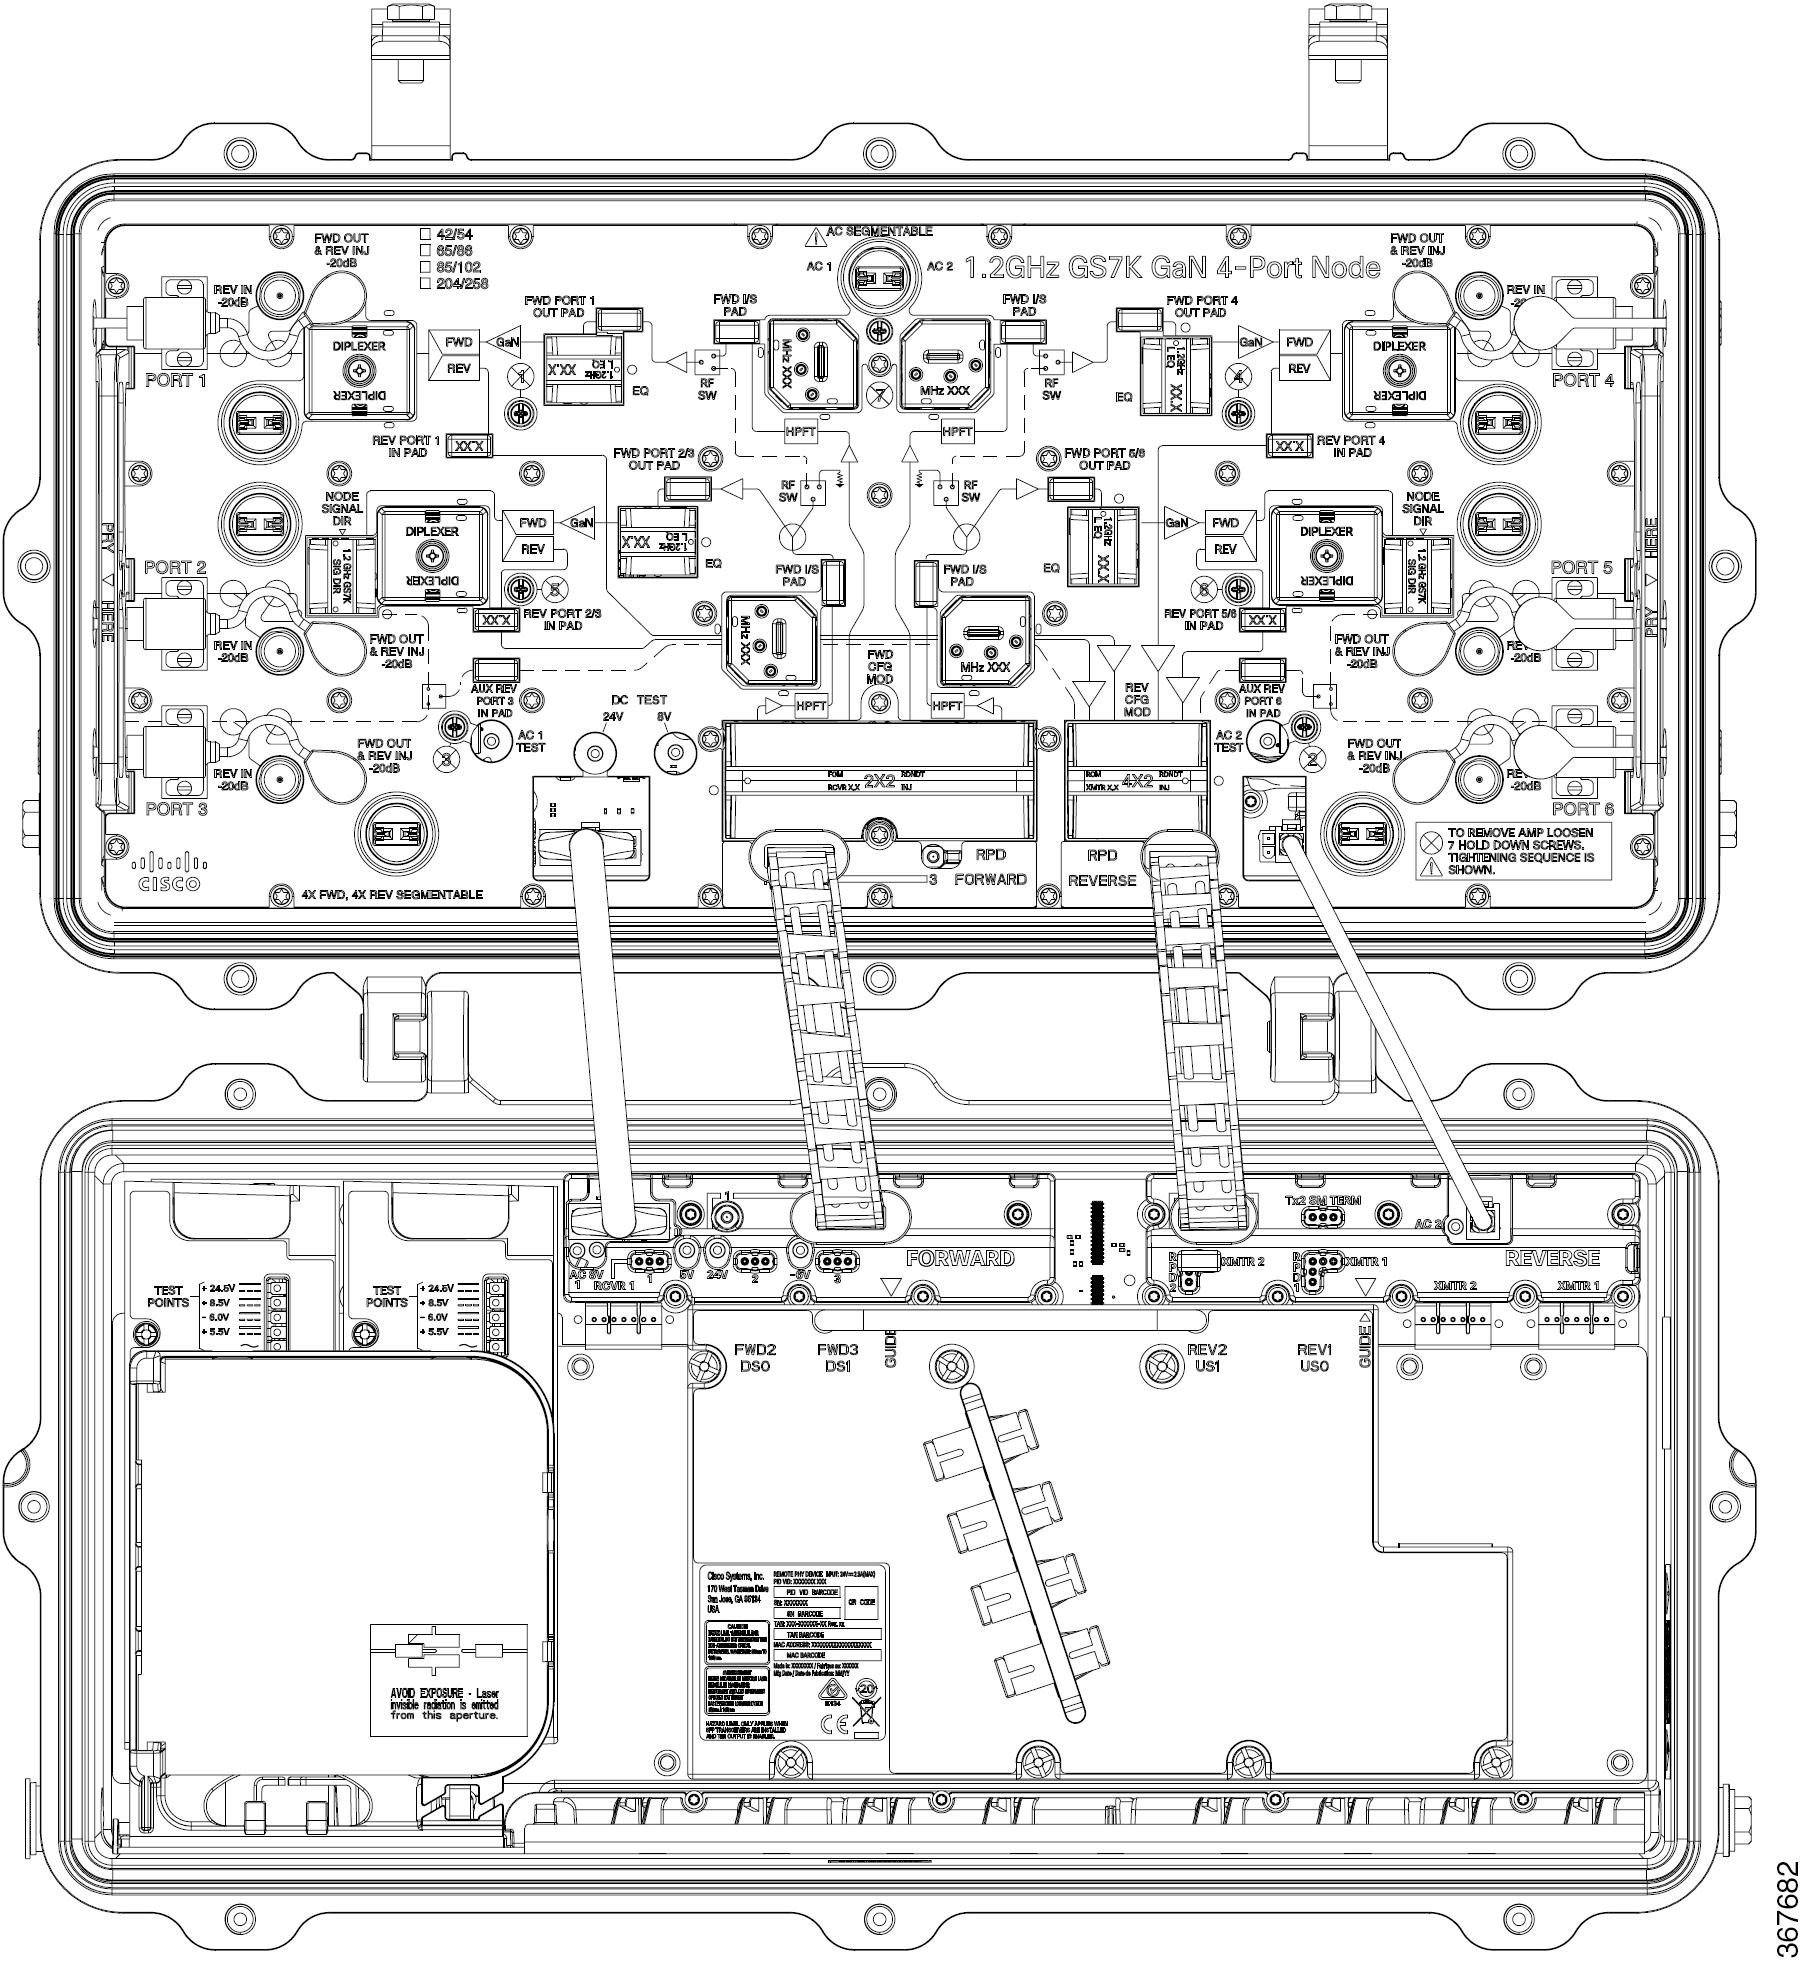 Cisco Gs7000 Super High Output Intelligent Node Software Fiber Optic Cable Schematic Locating Hole